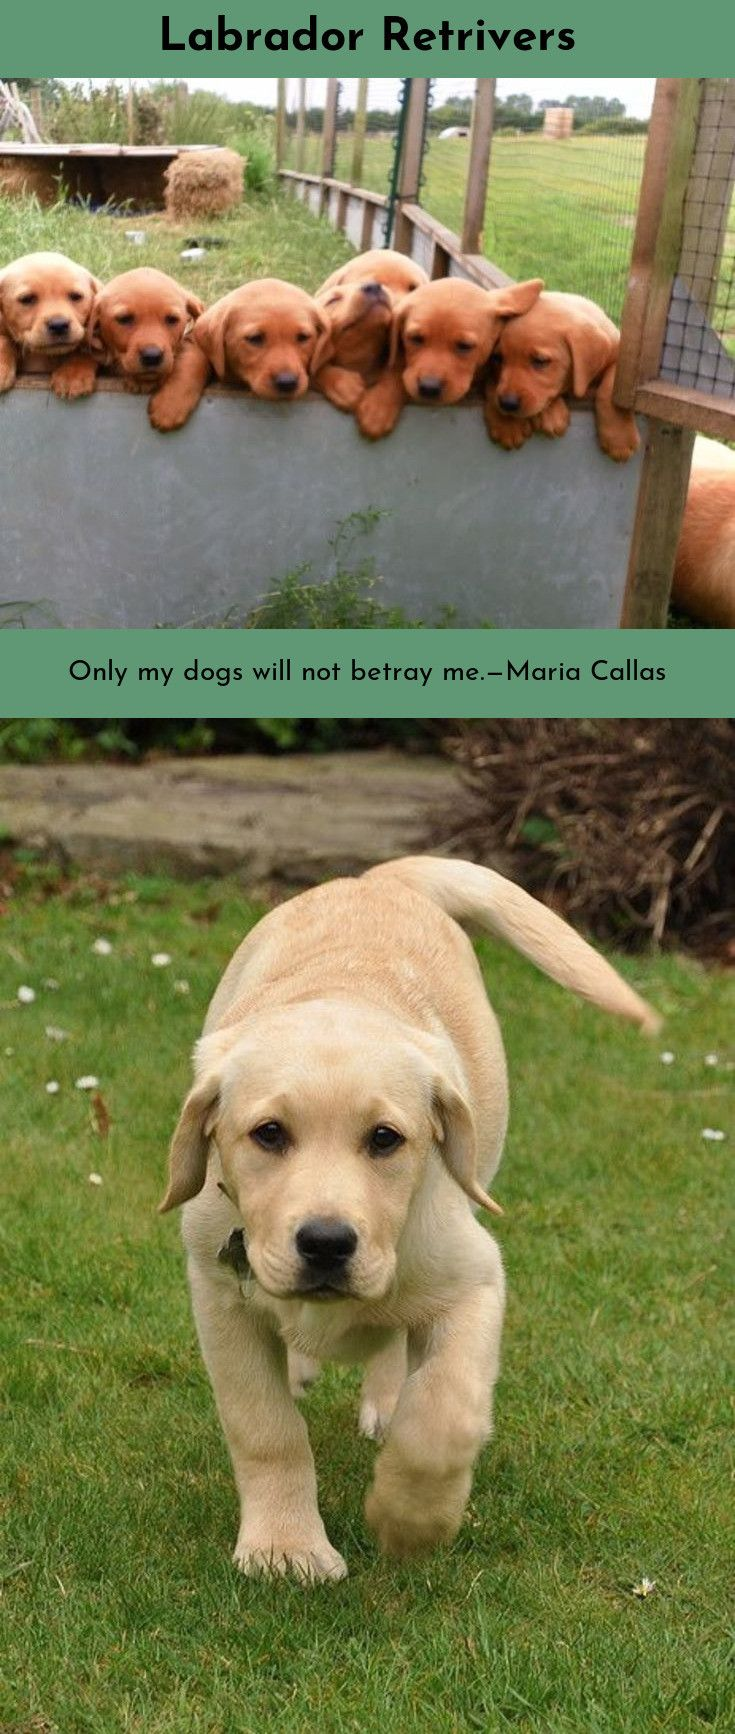 Labrador Retriever Intelligent And Fun Loving Labrador Retriever Labrador Lab Puppies